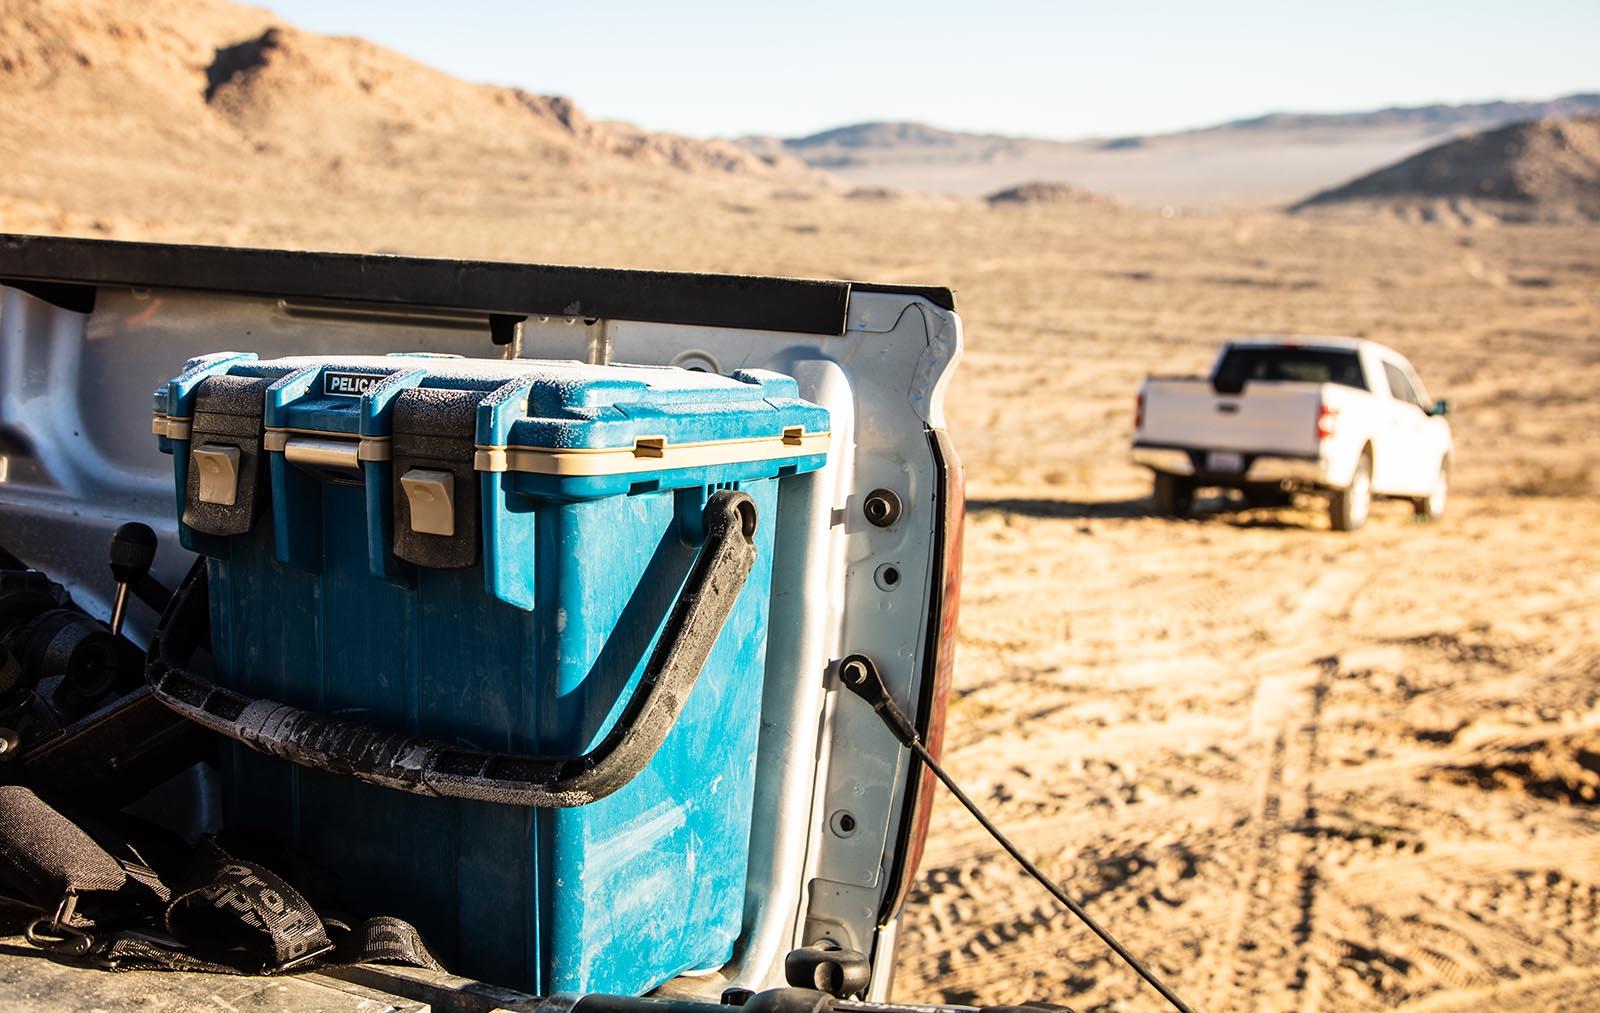 20qt cooler in truck bed